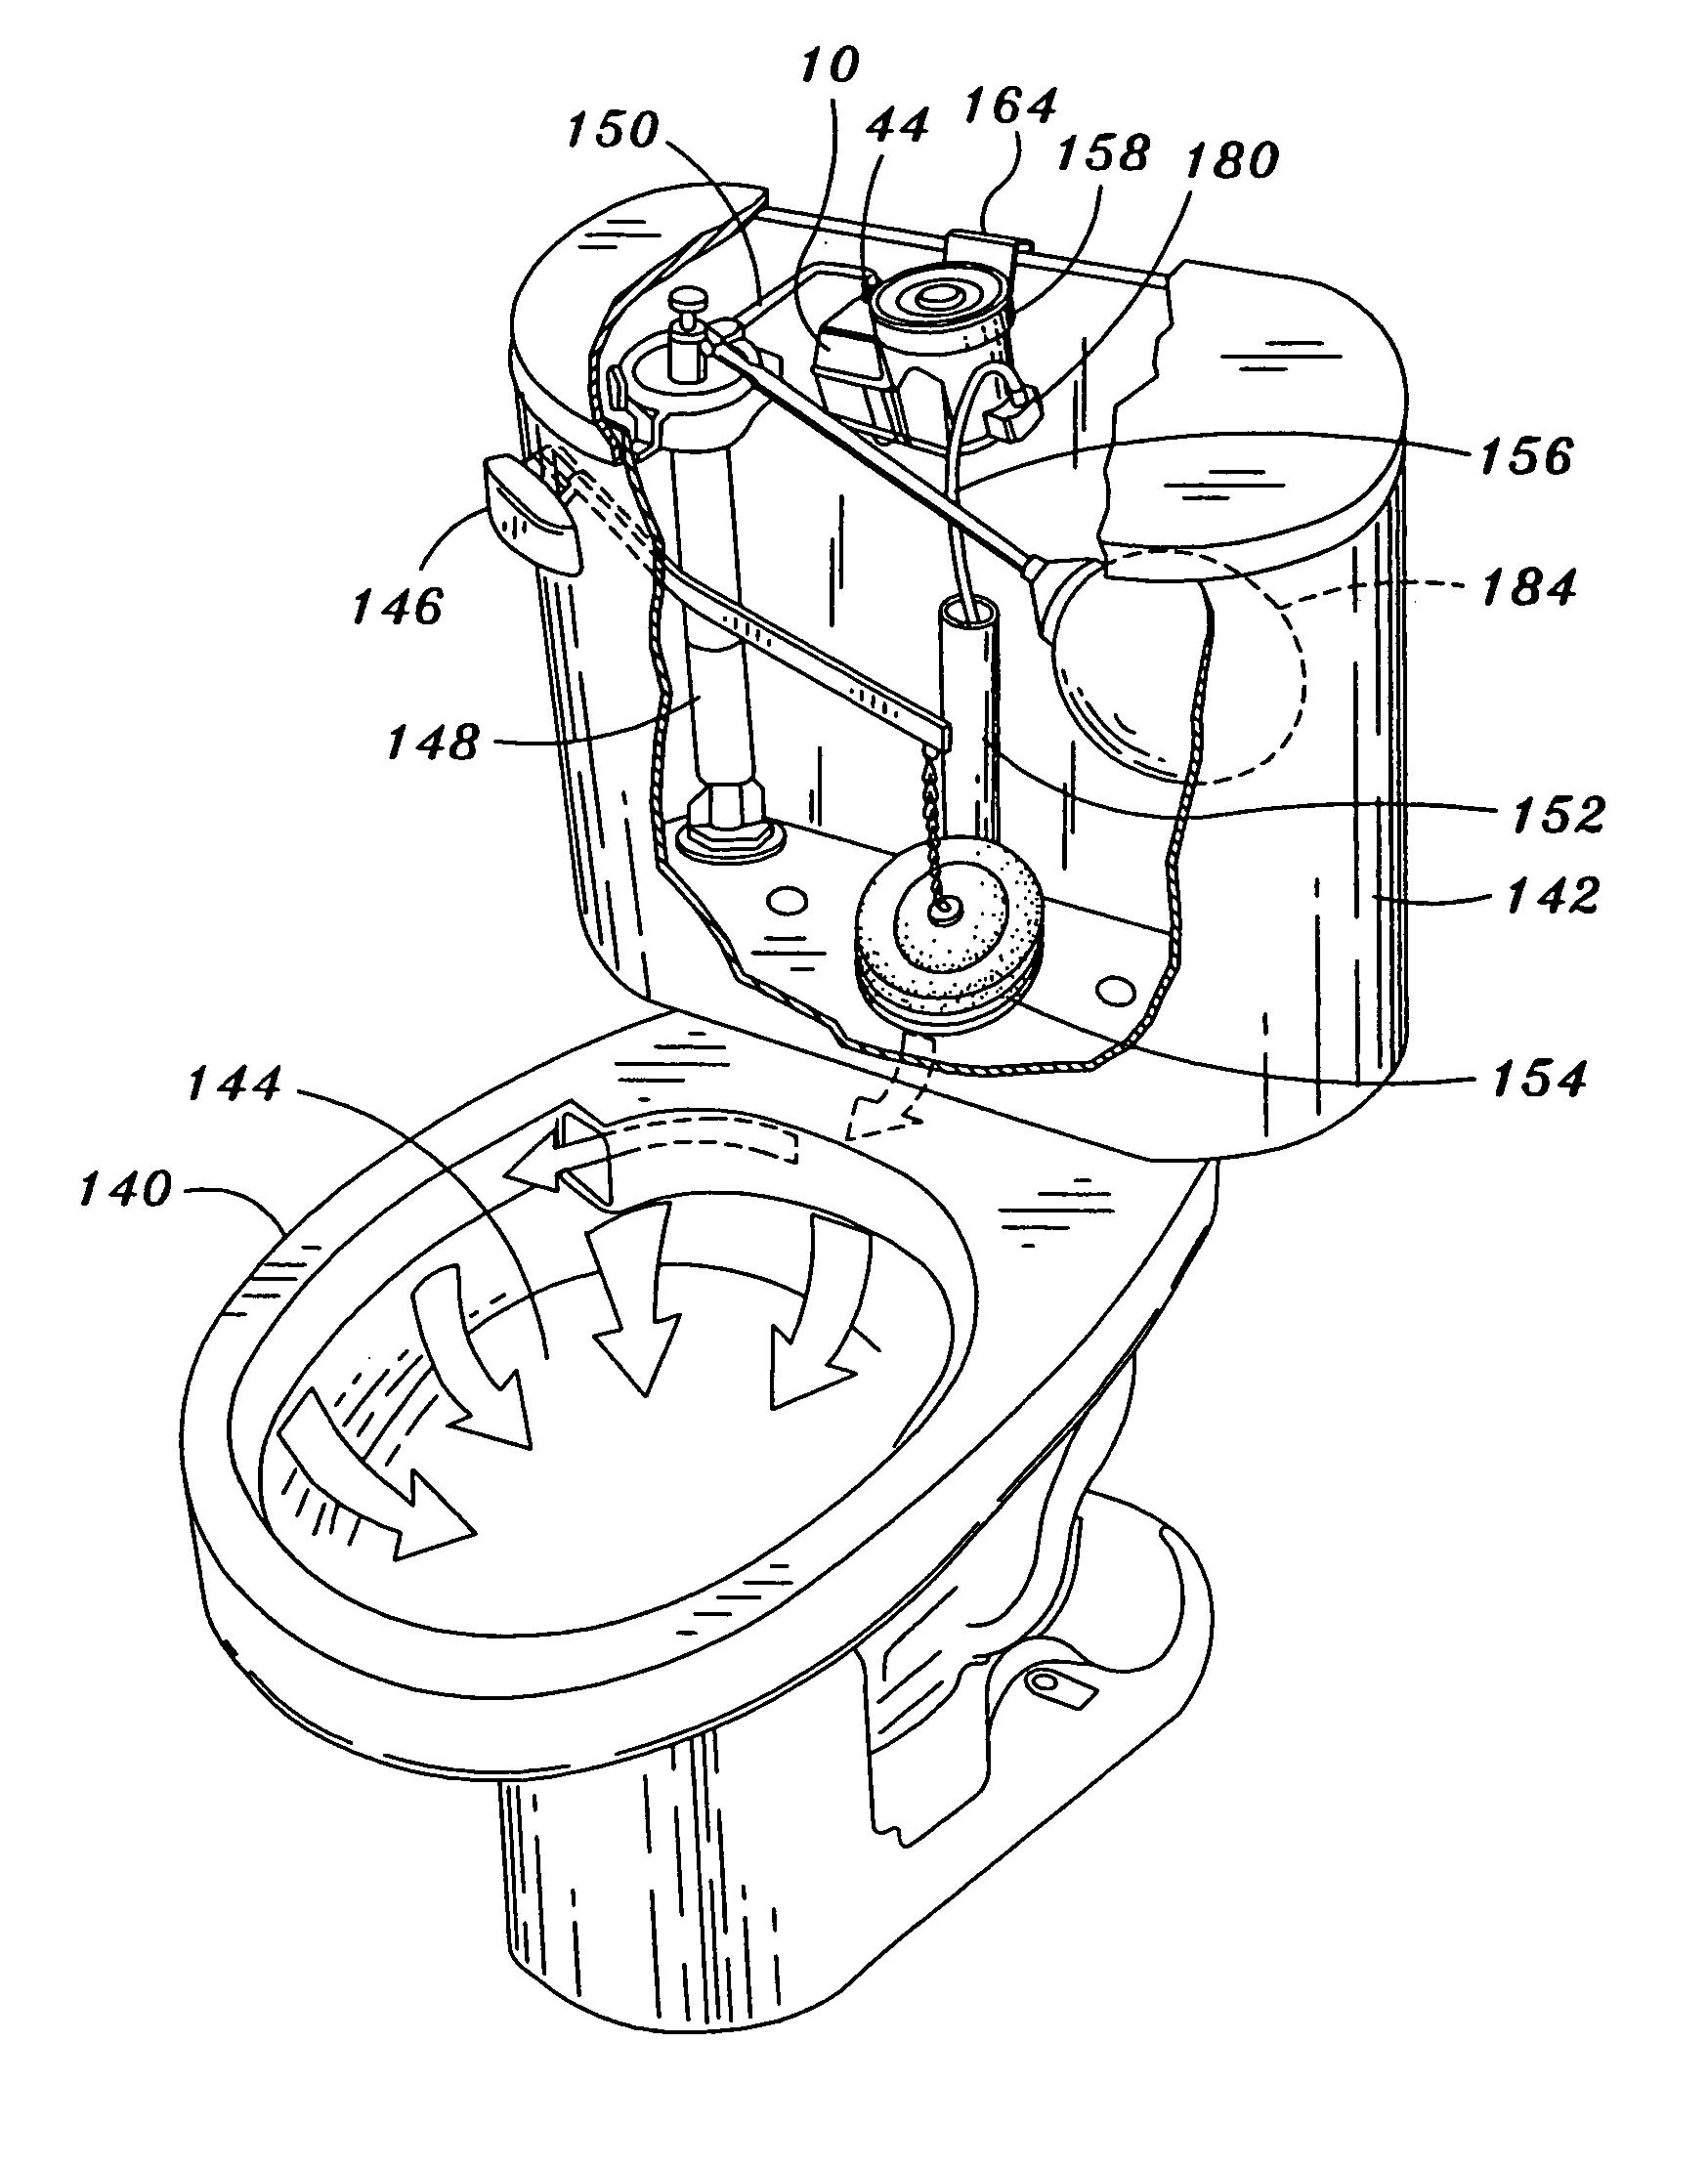 Anatomy of a toilet bowl 3677789 - follow4more.info